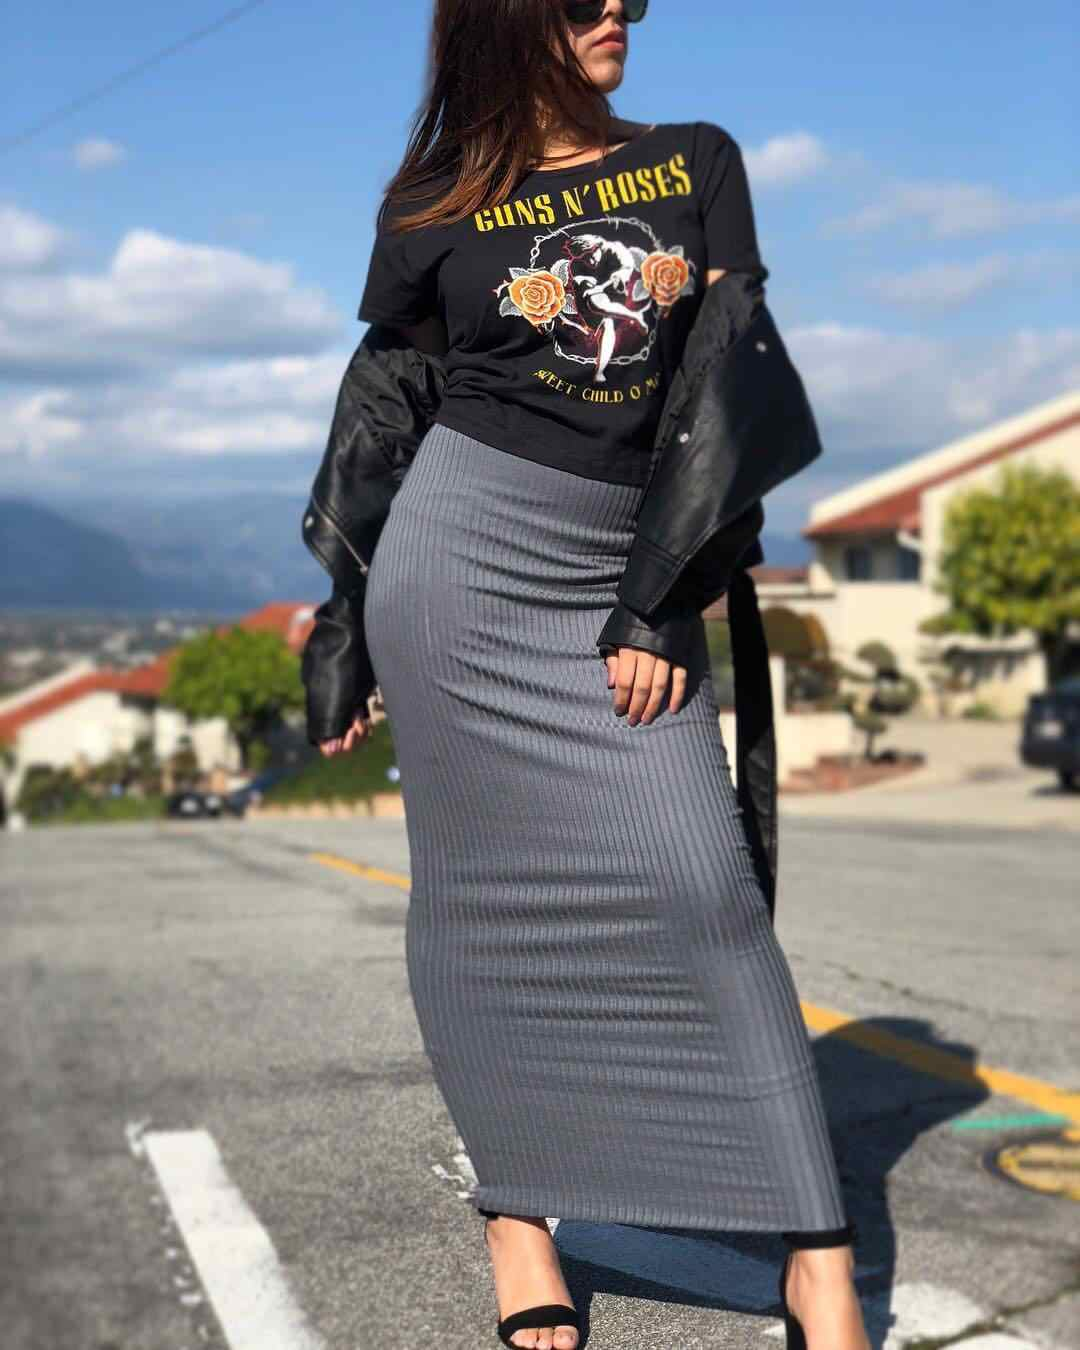 Women Wrap Skirt Bodycon Pencil Sheath Knitting Muslim Maxi Bottoms Sarong Islamic Skirt Ankle-Length